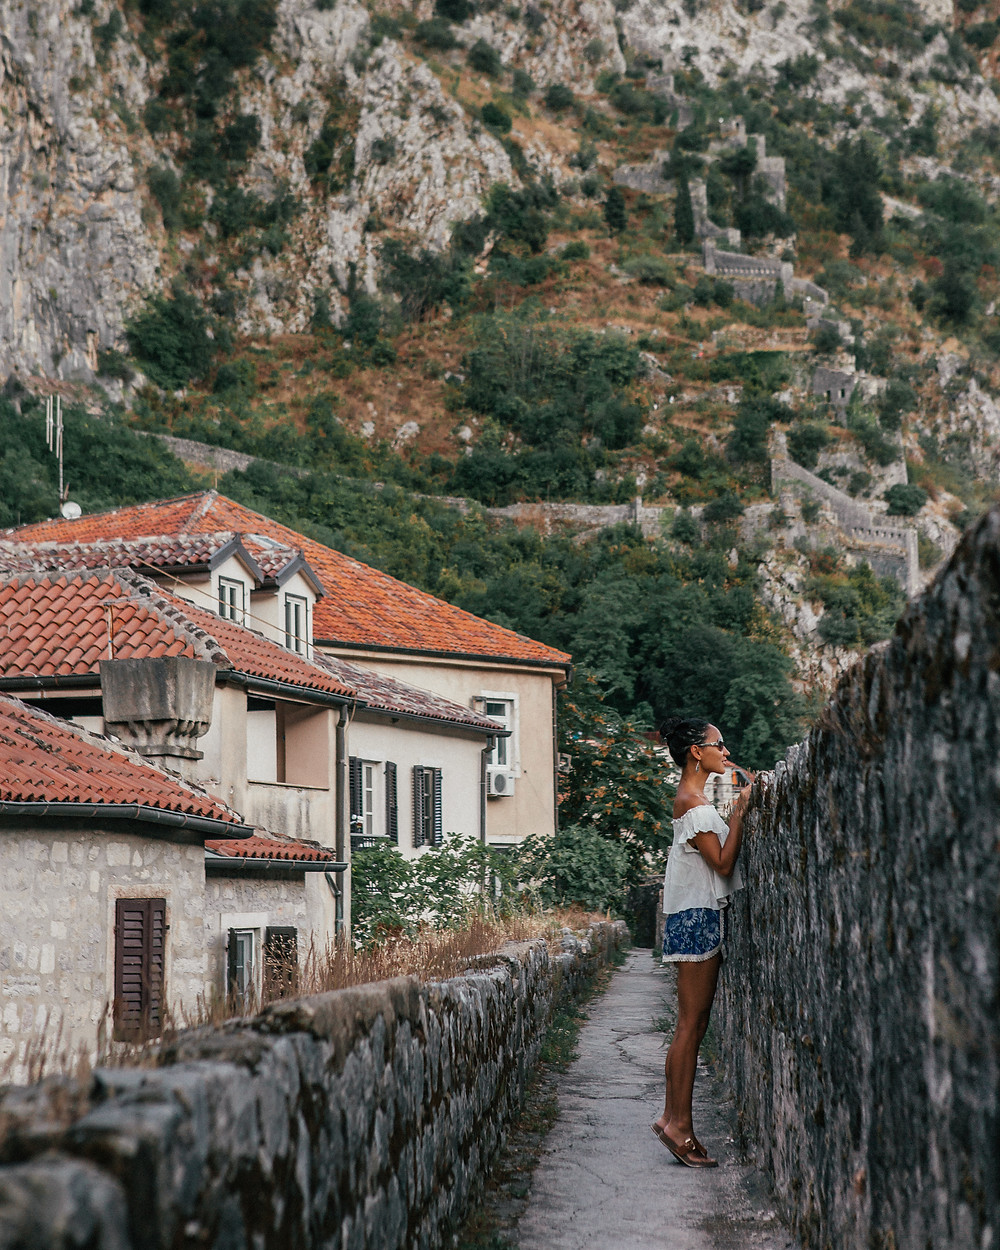 City Walls, Kotor, Montengro